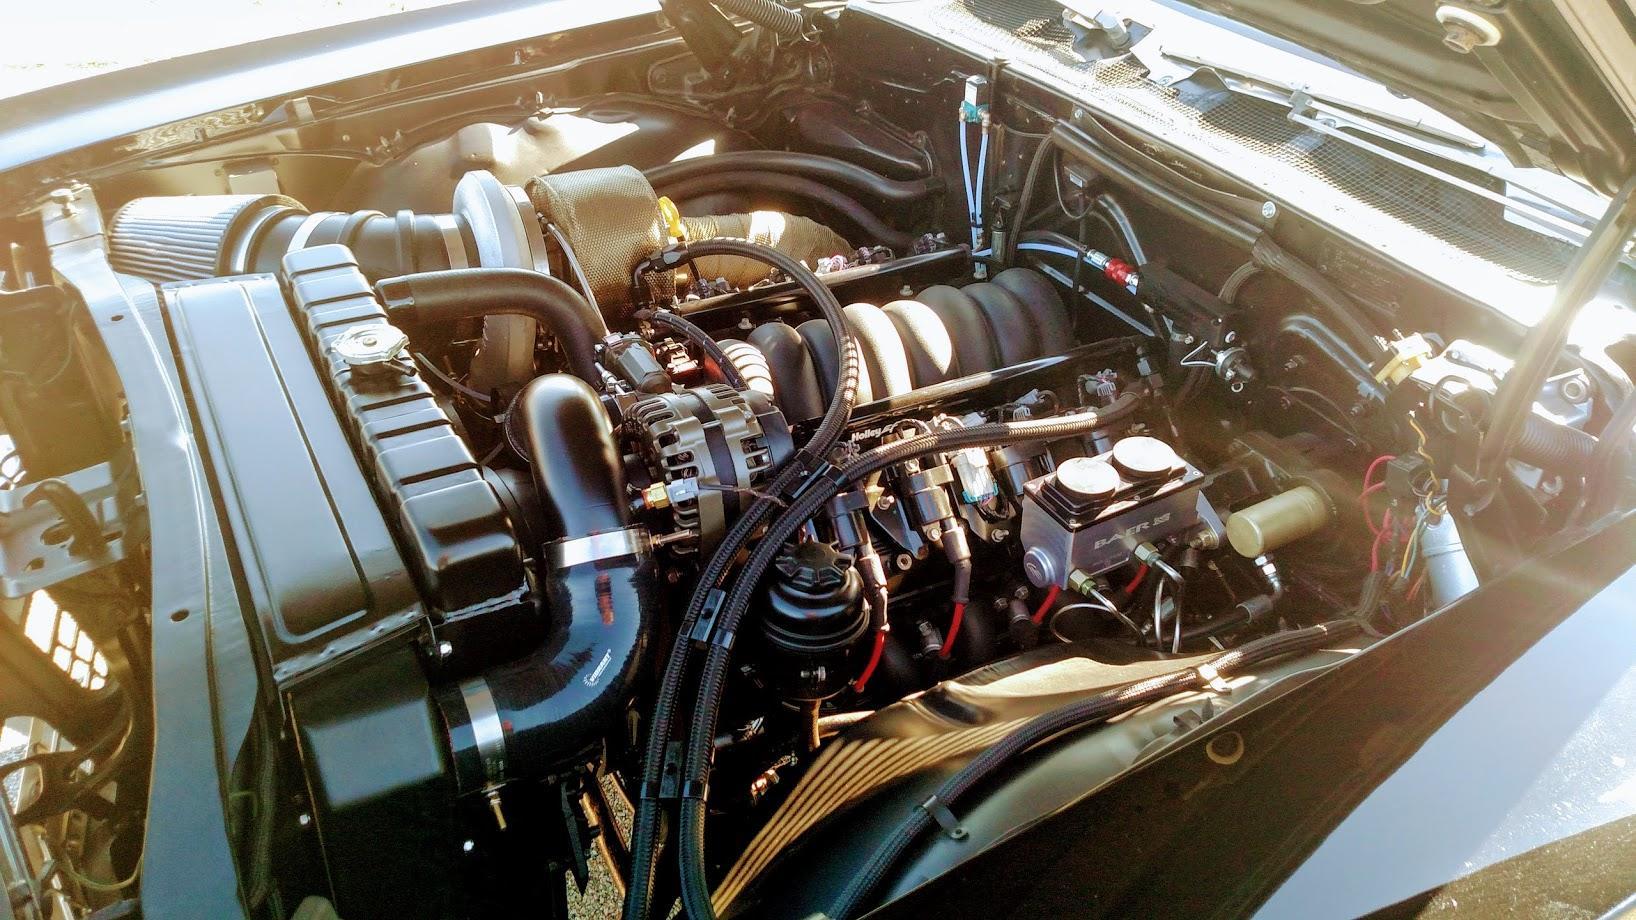 68 Impala FastBlack Slo-Touring